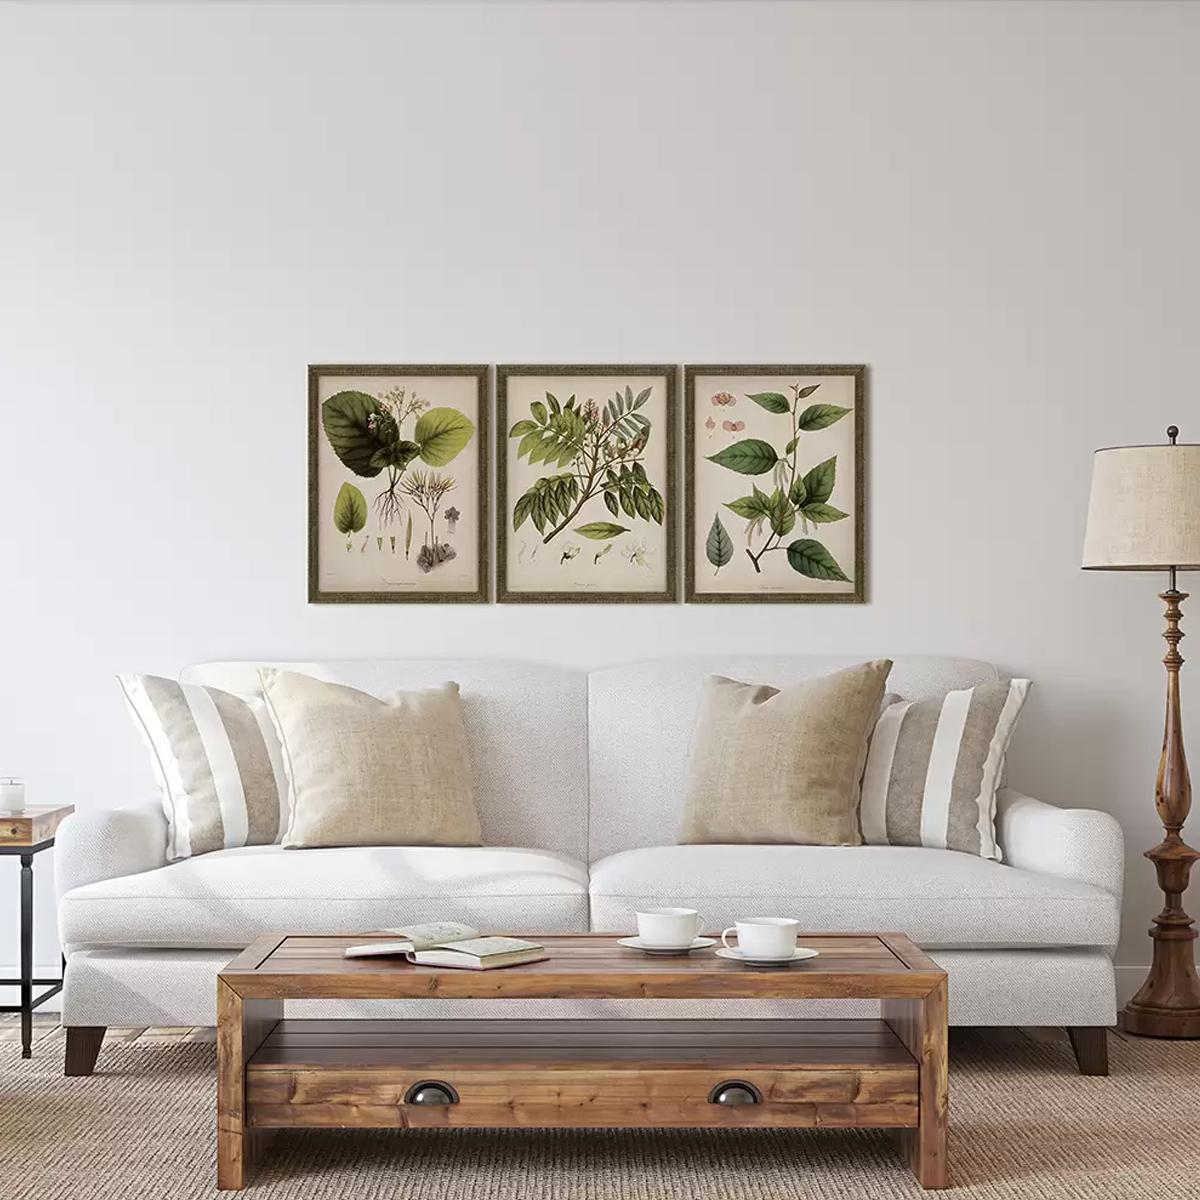 Picture of VINTAGE PLANT PRINTS I S/3